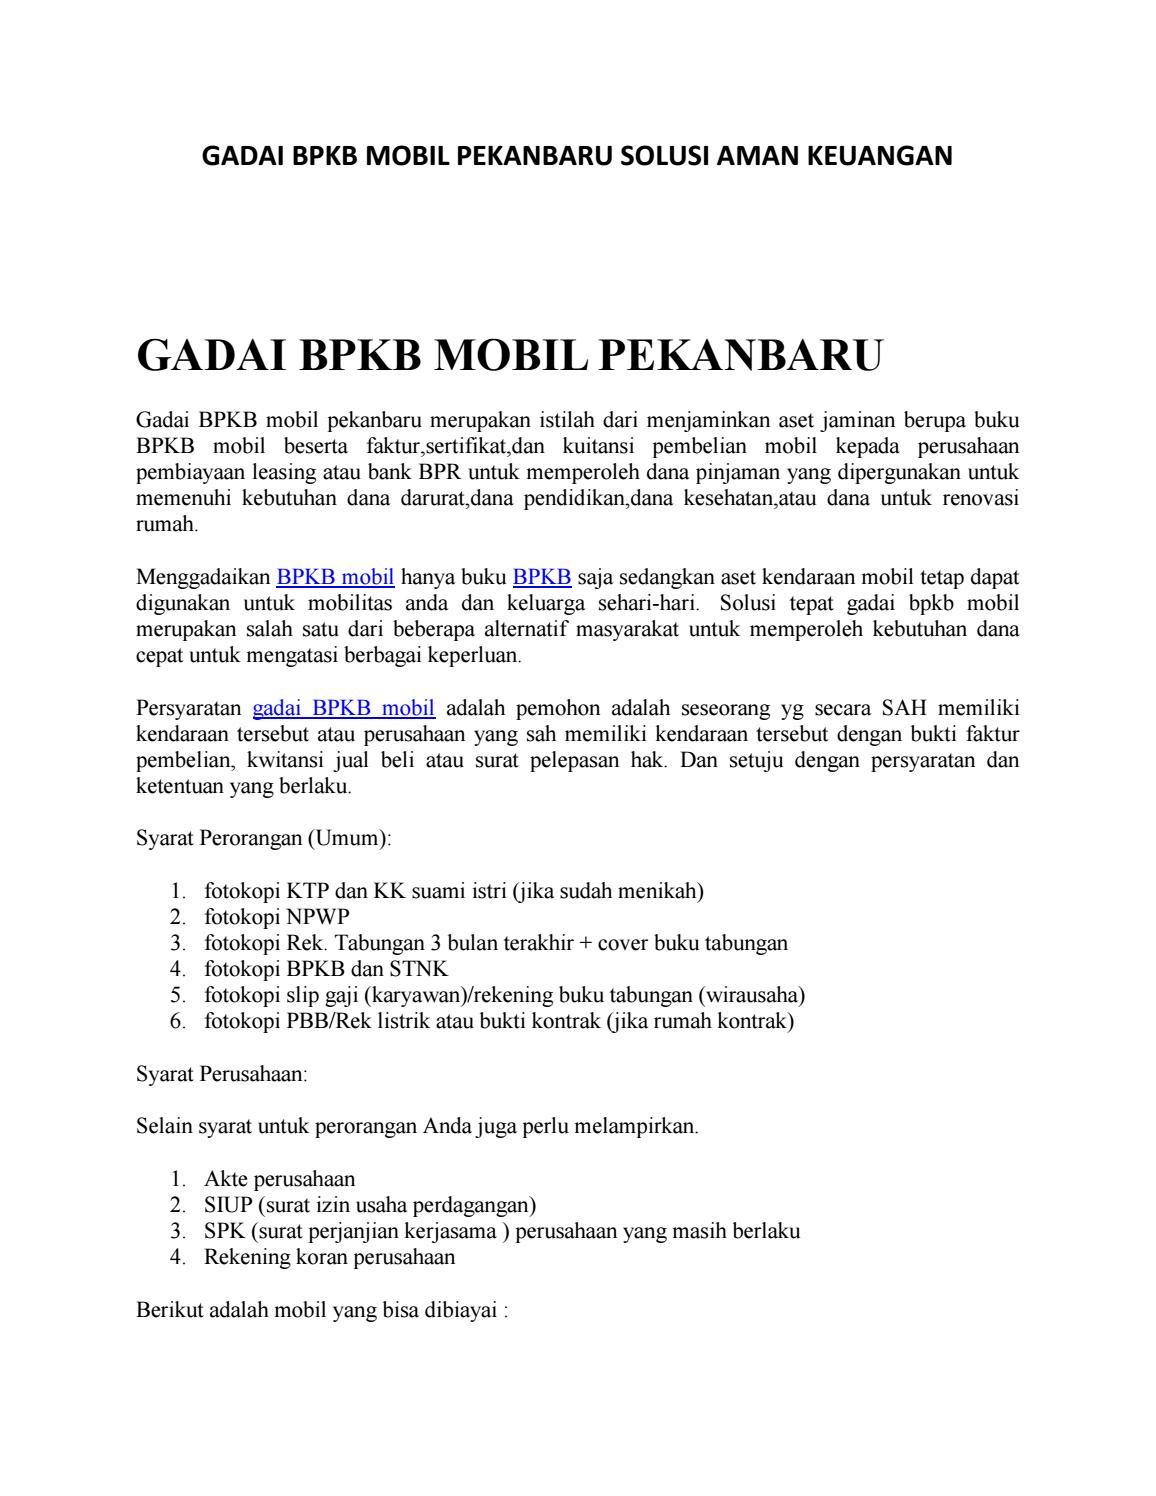 Gadai Bpkb Mobil Pekanbaru By Pembiayaan Bpkb Issuu